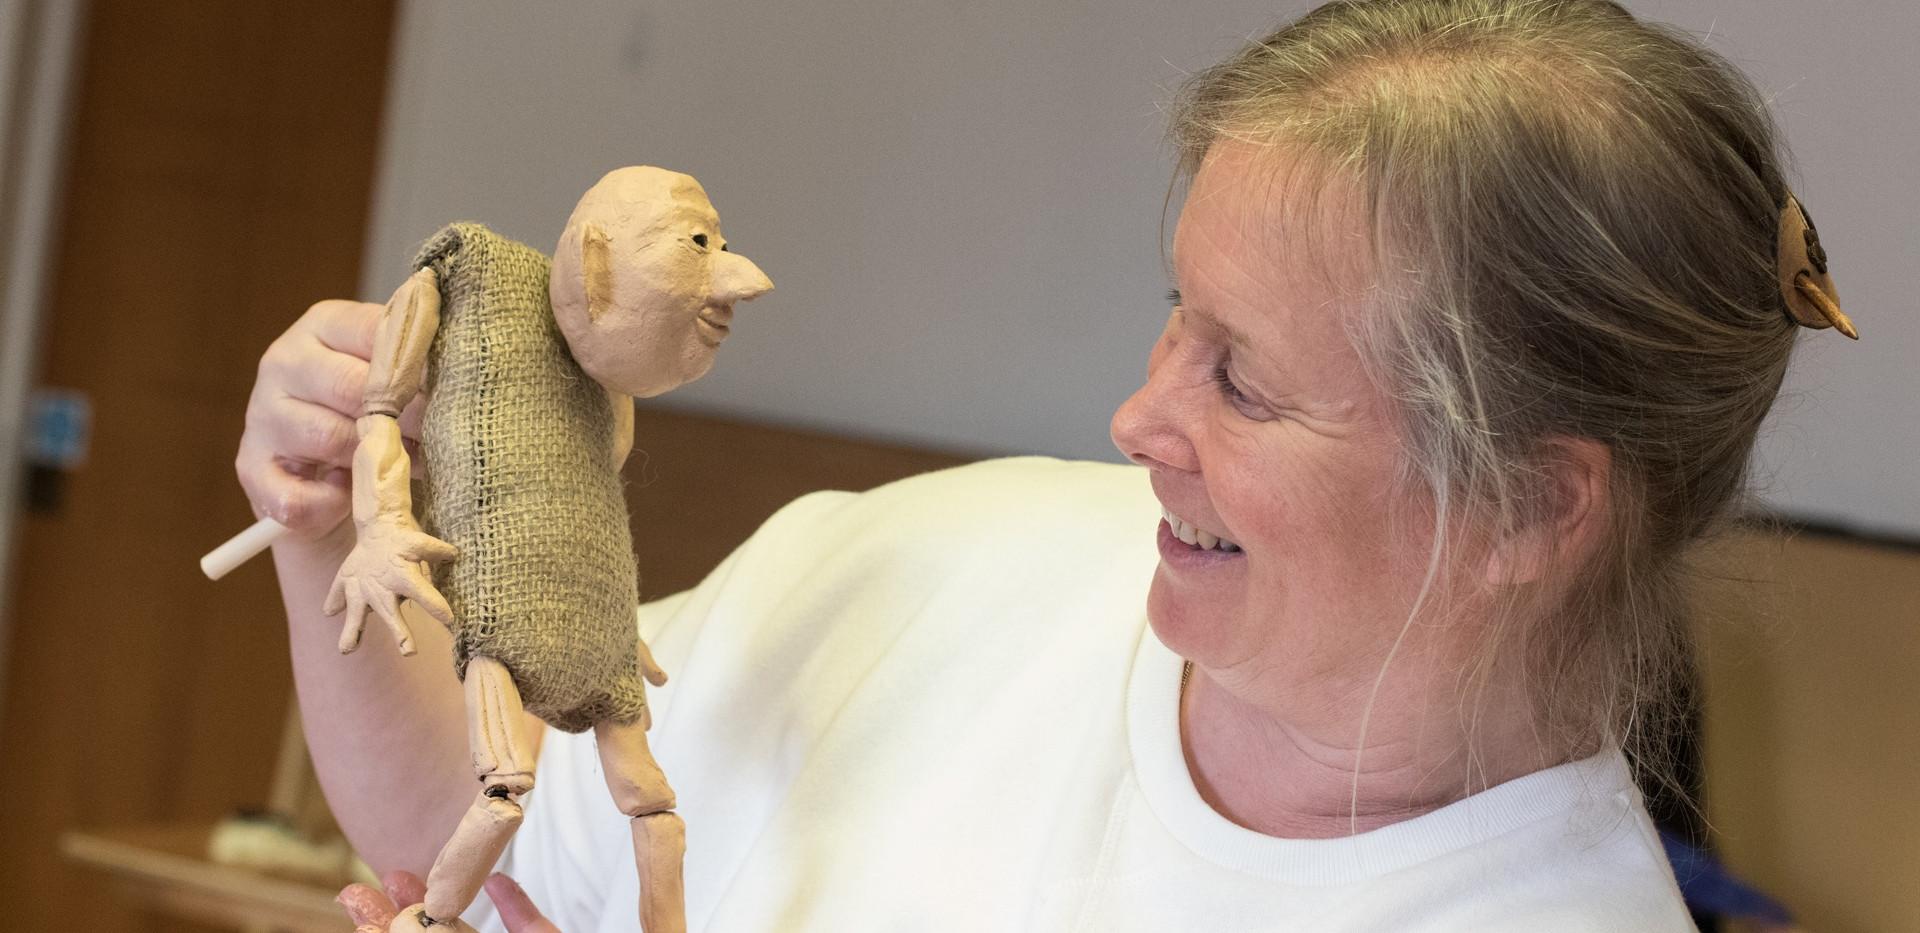 Beginner's Puppet Workshop by Strangeface